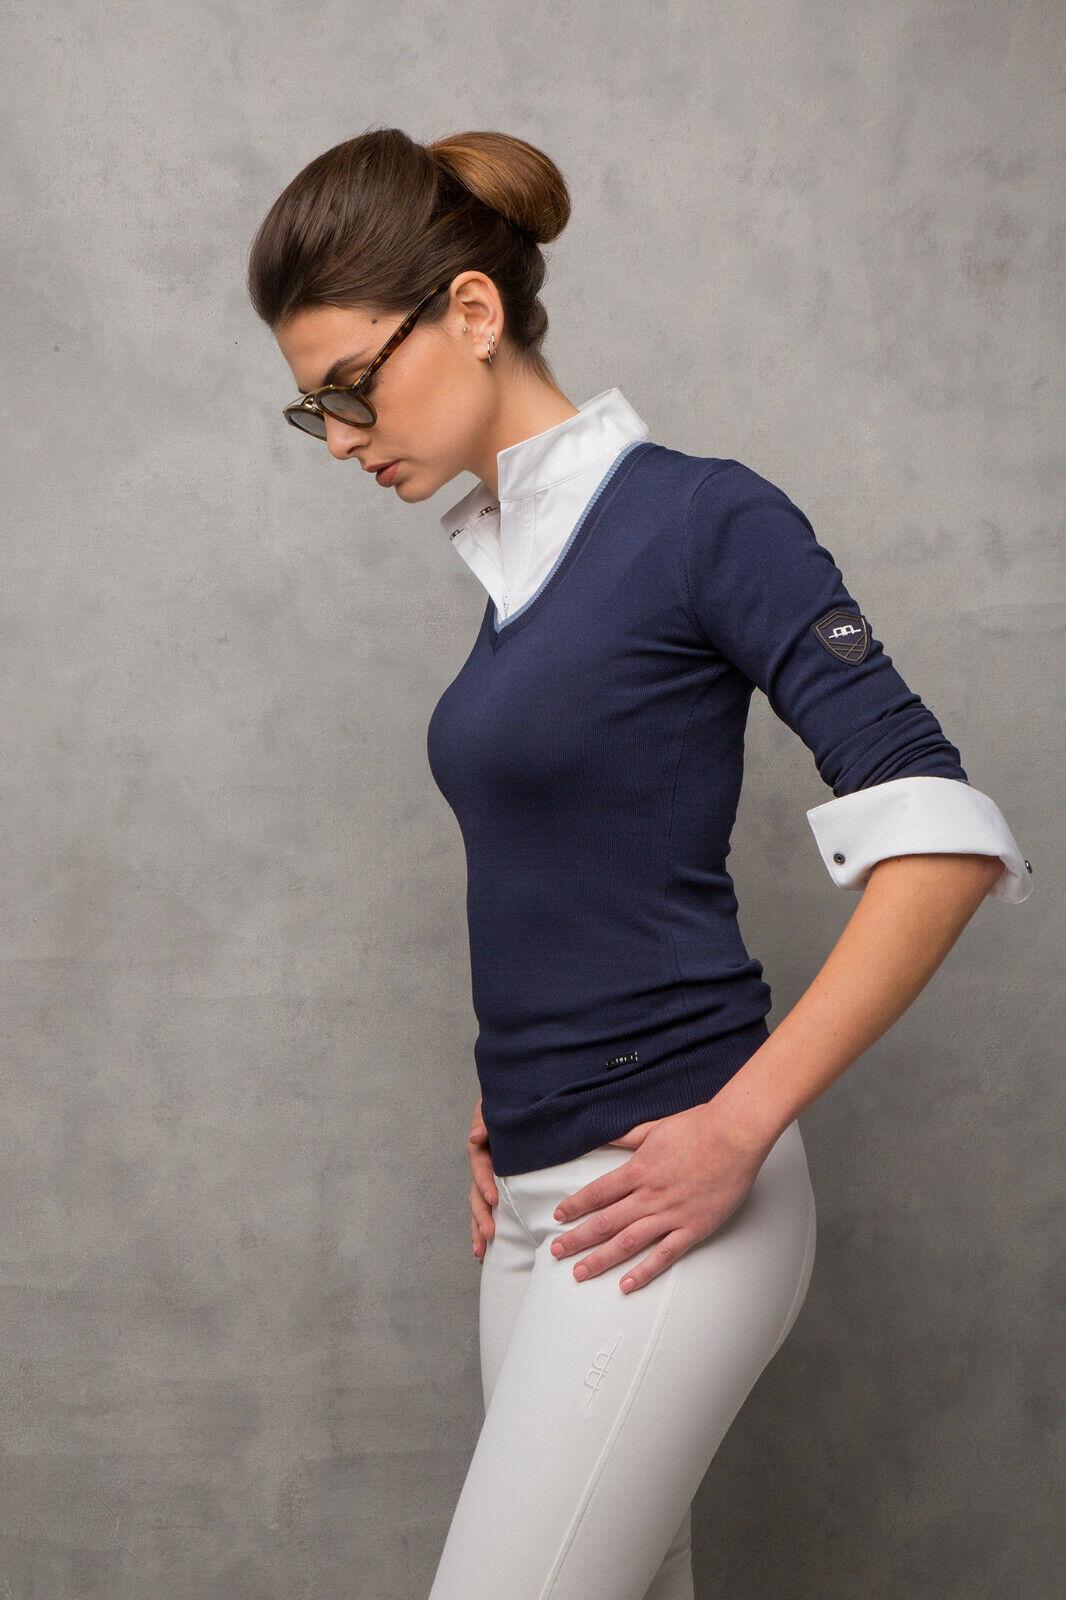 cavalloware AA Platinum Collection Donna classeico Lavorato a Maglia vneck Sweater Navy XSXXL